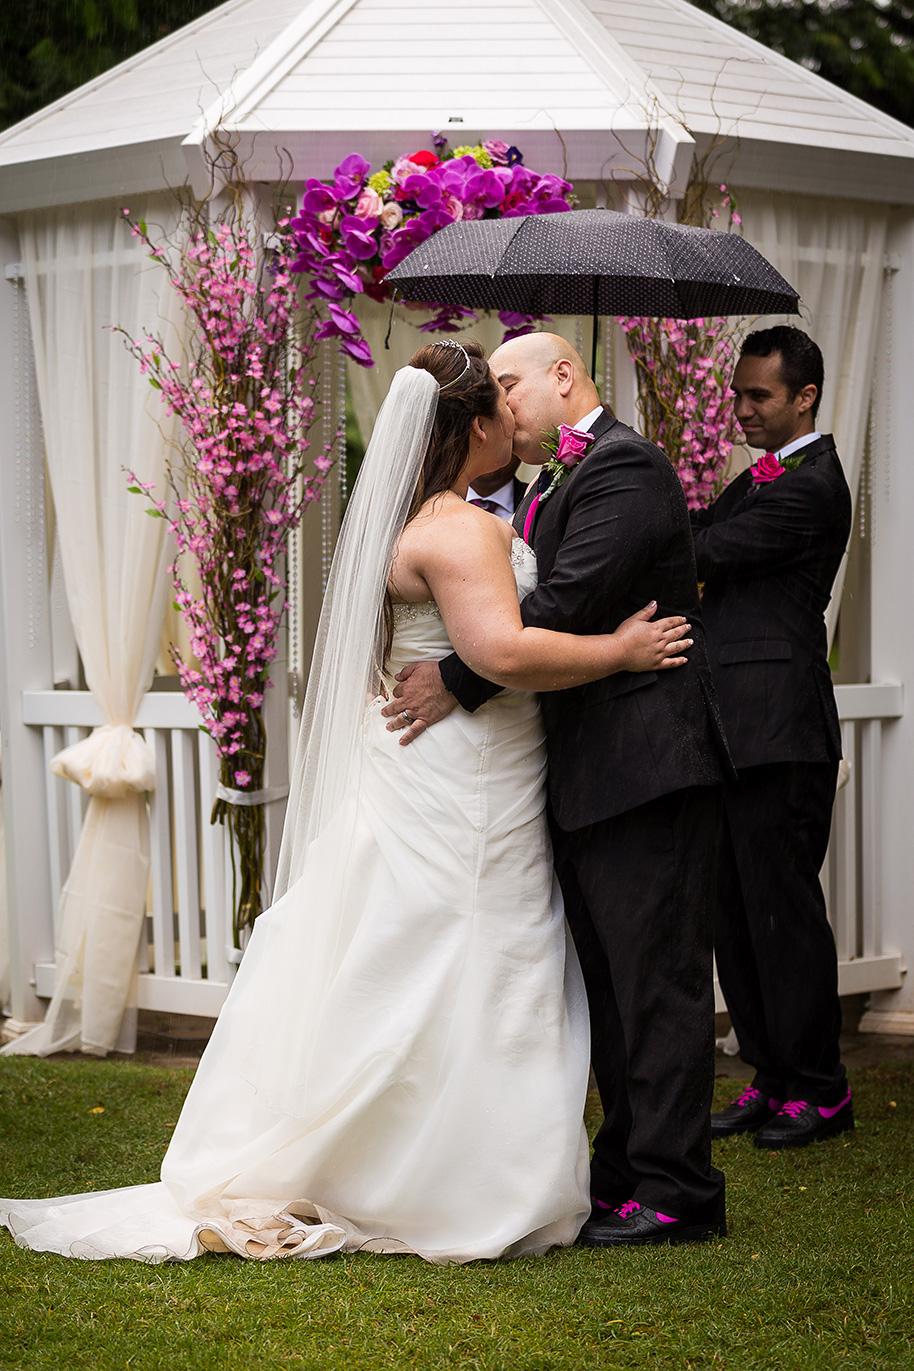 Star-Wars-Wedding-040116-26.jpg